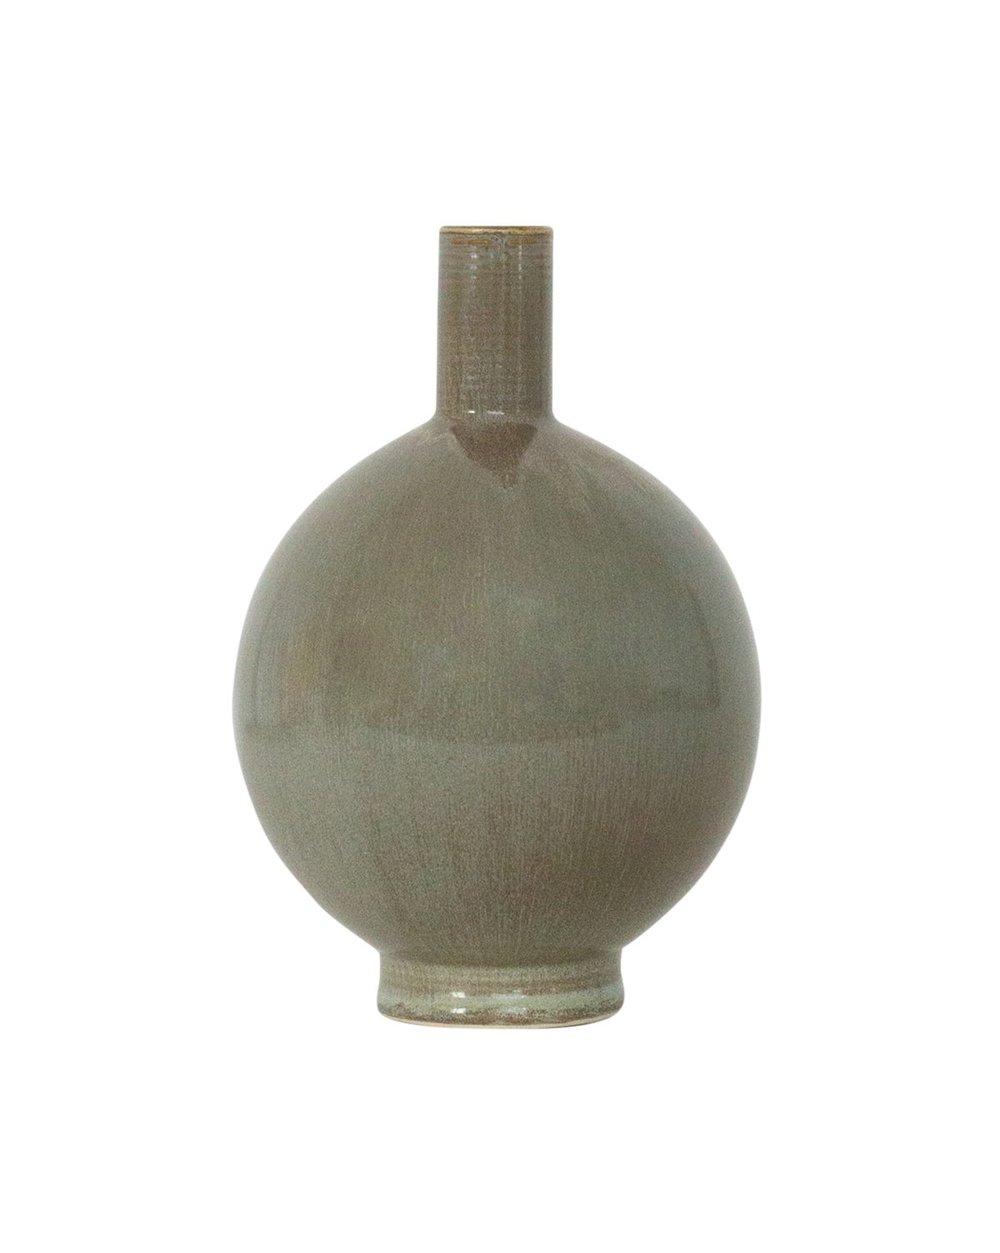 Bulbous_Stoneware_Vase_1.jpg